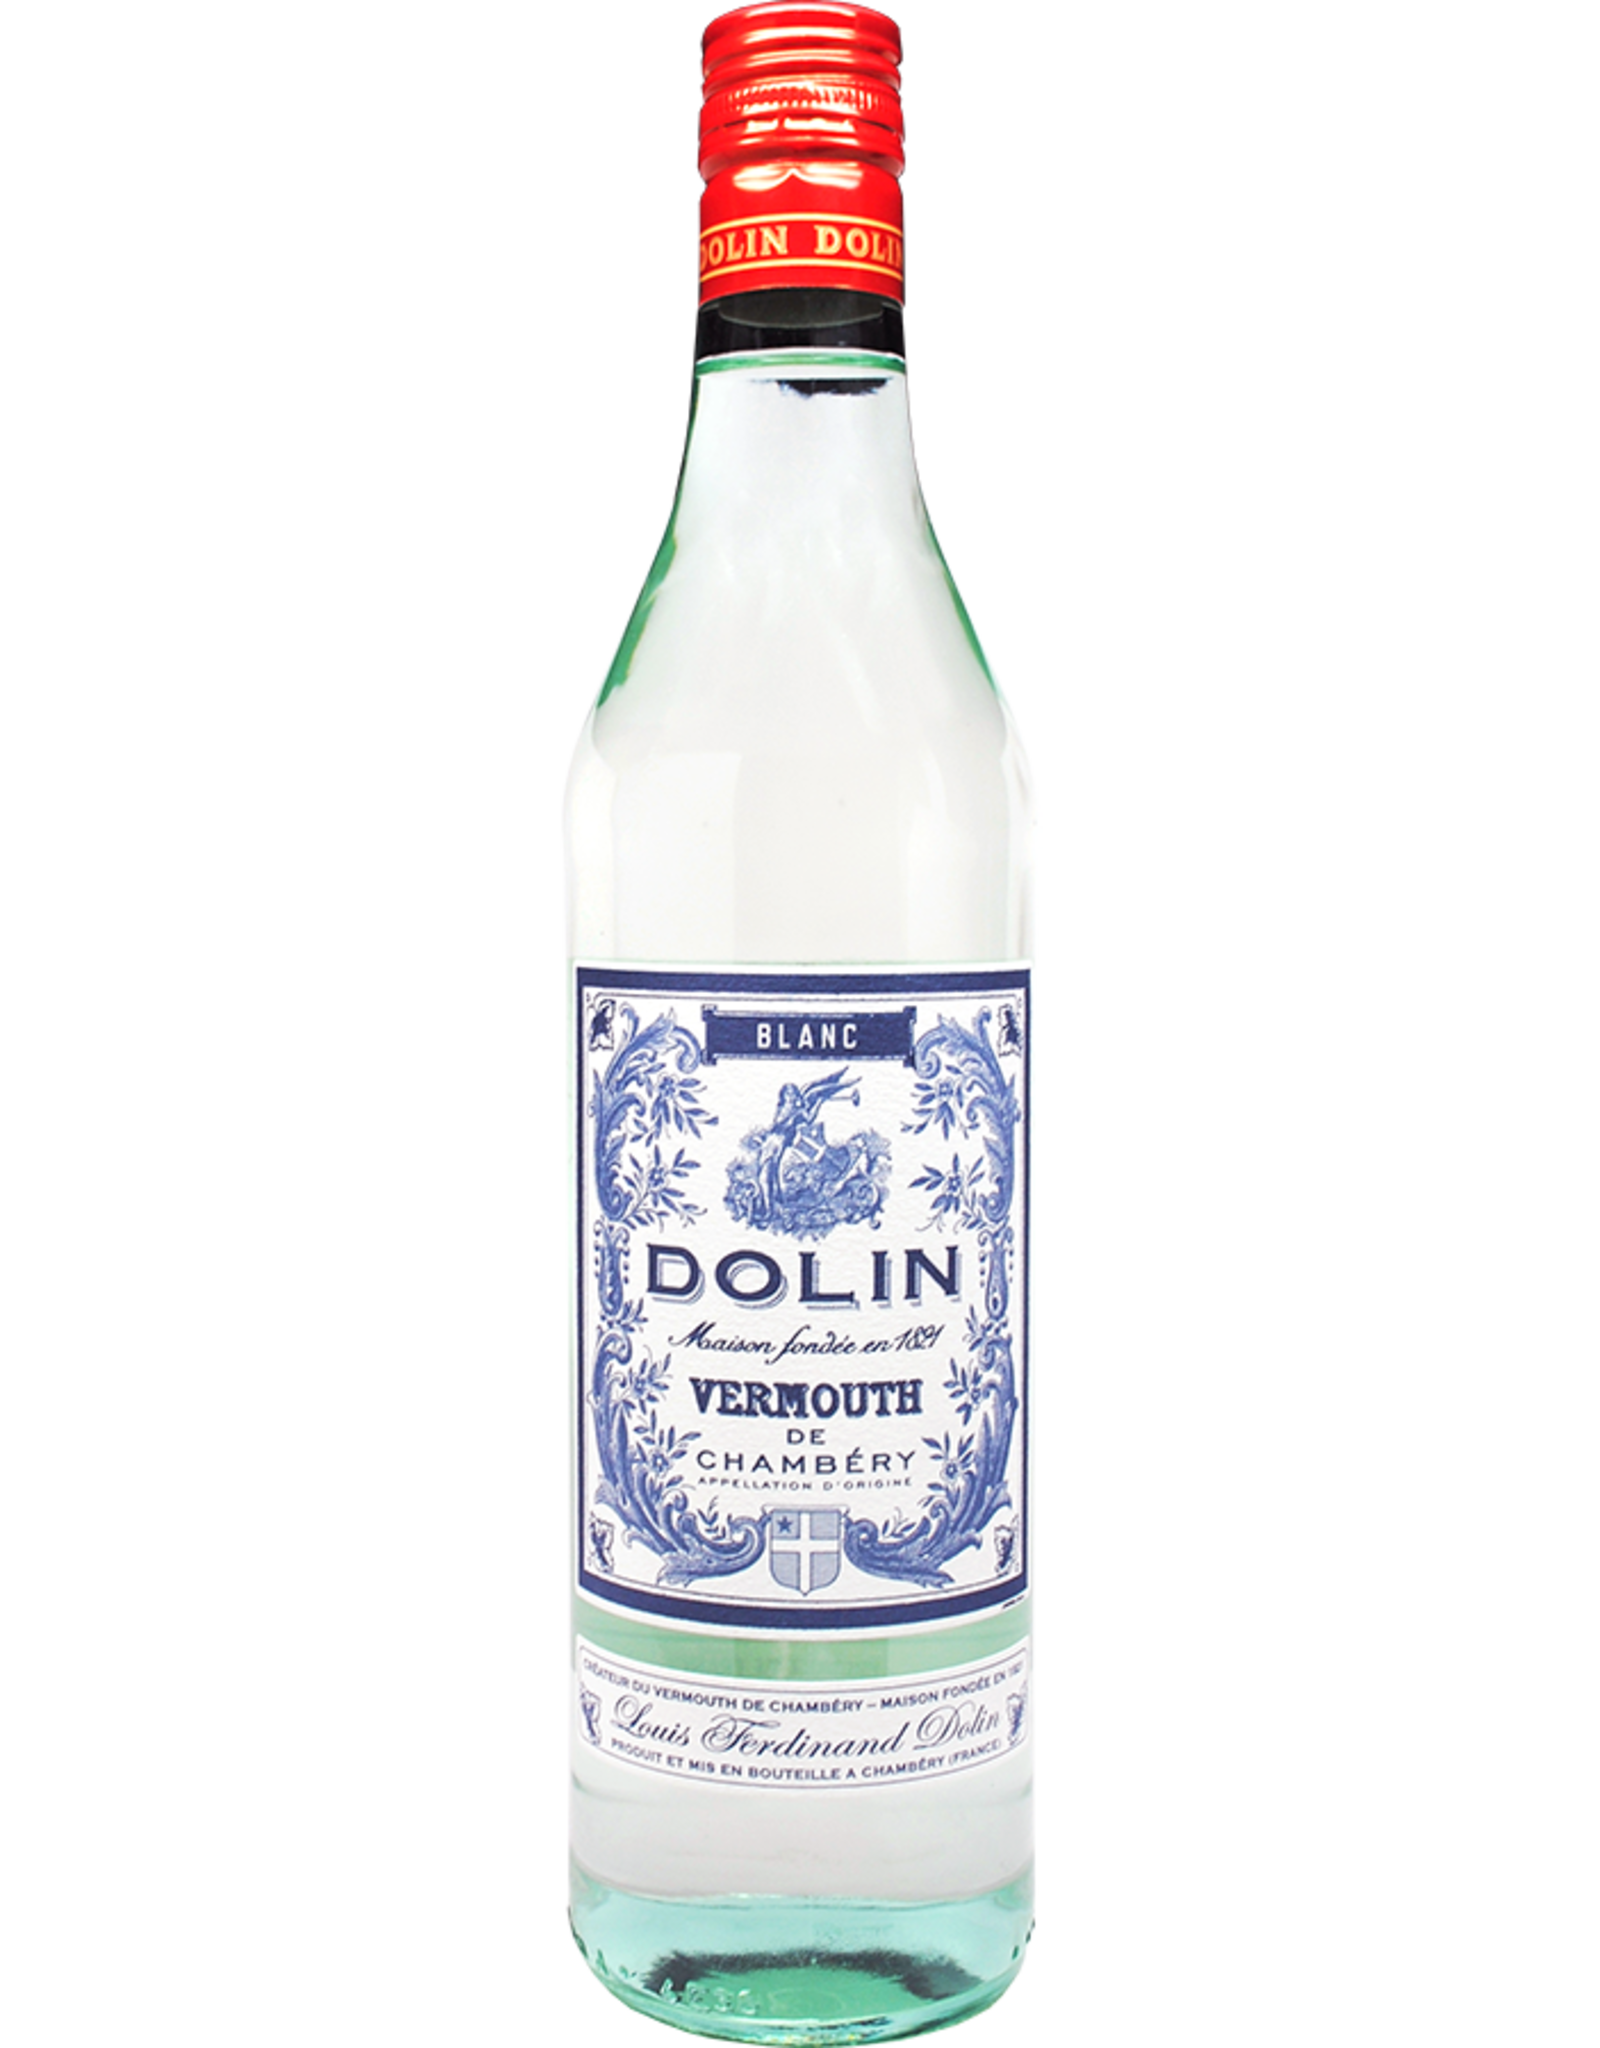 Dolin Dolin Vermouth de Chambery Blanc 375ml